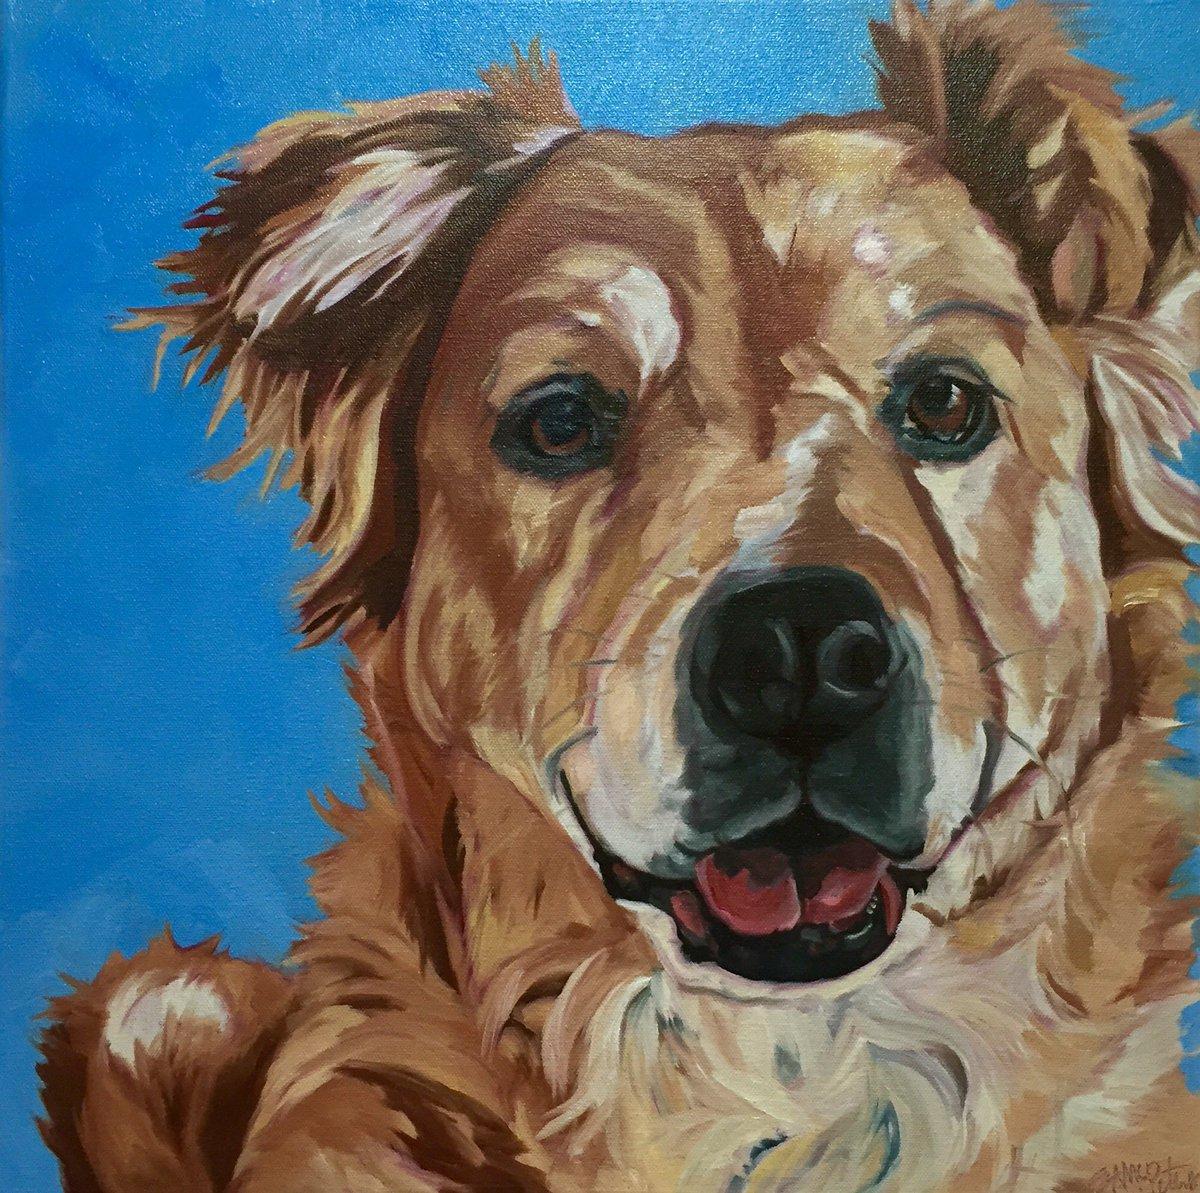 On the easel today. A beautiful #goldenretriever #barkingdogcreationsstudio #100daysofdogart #100daysproject #dogart https://t.co/f6eCLNbRiJ